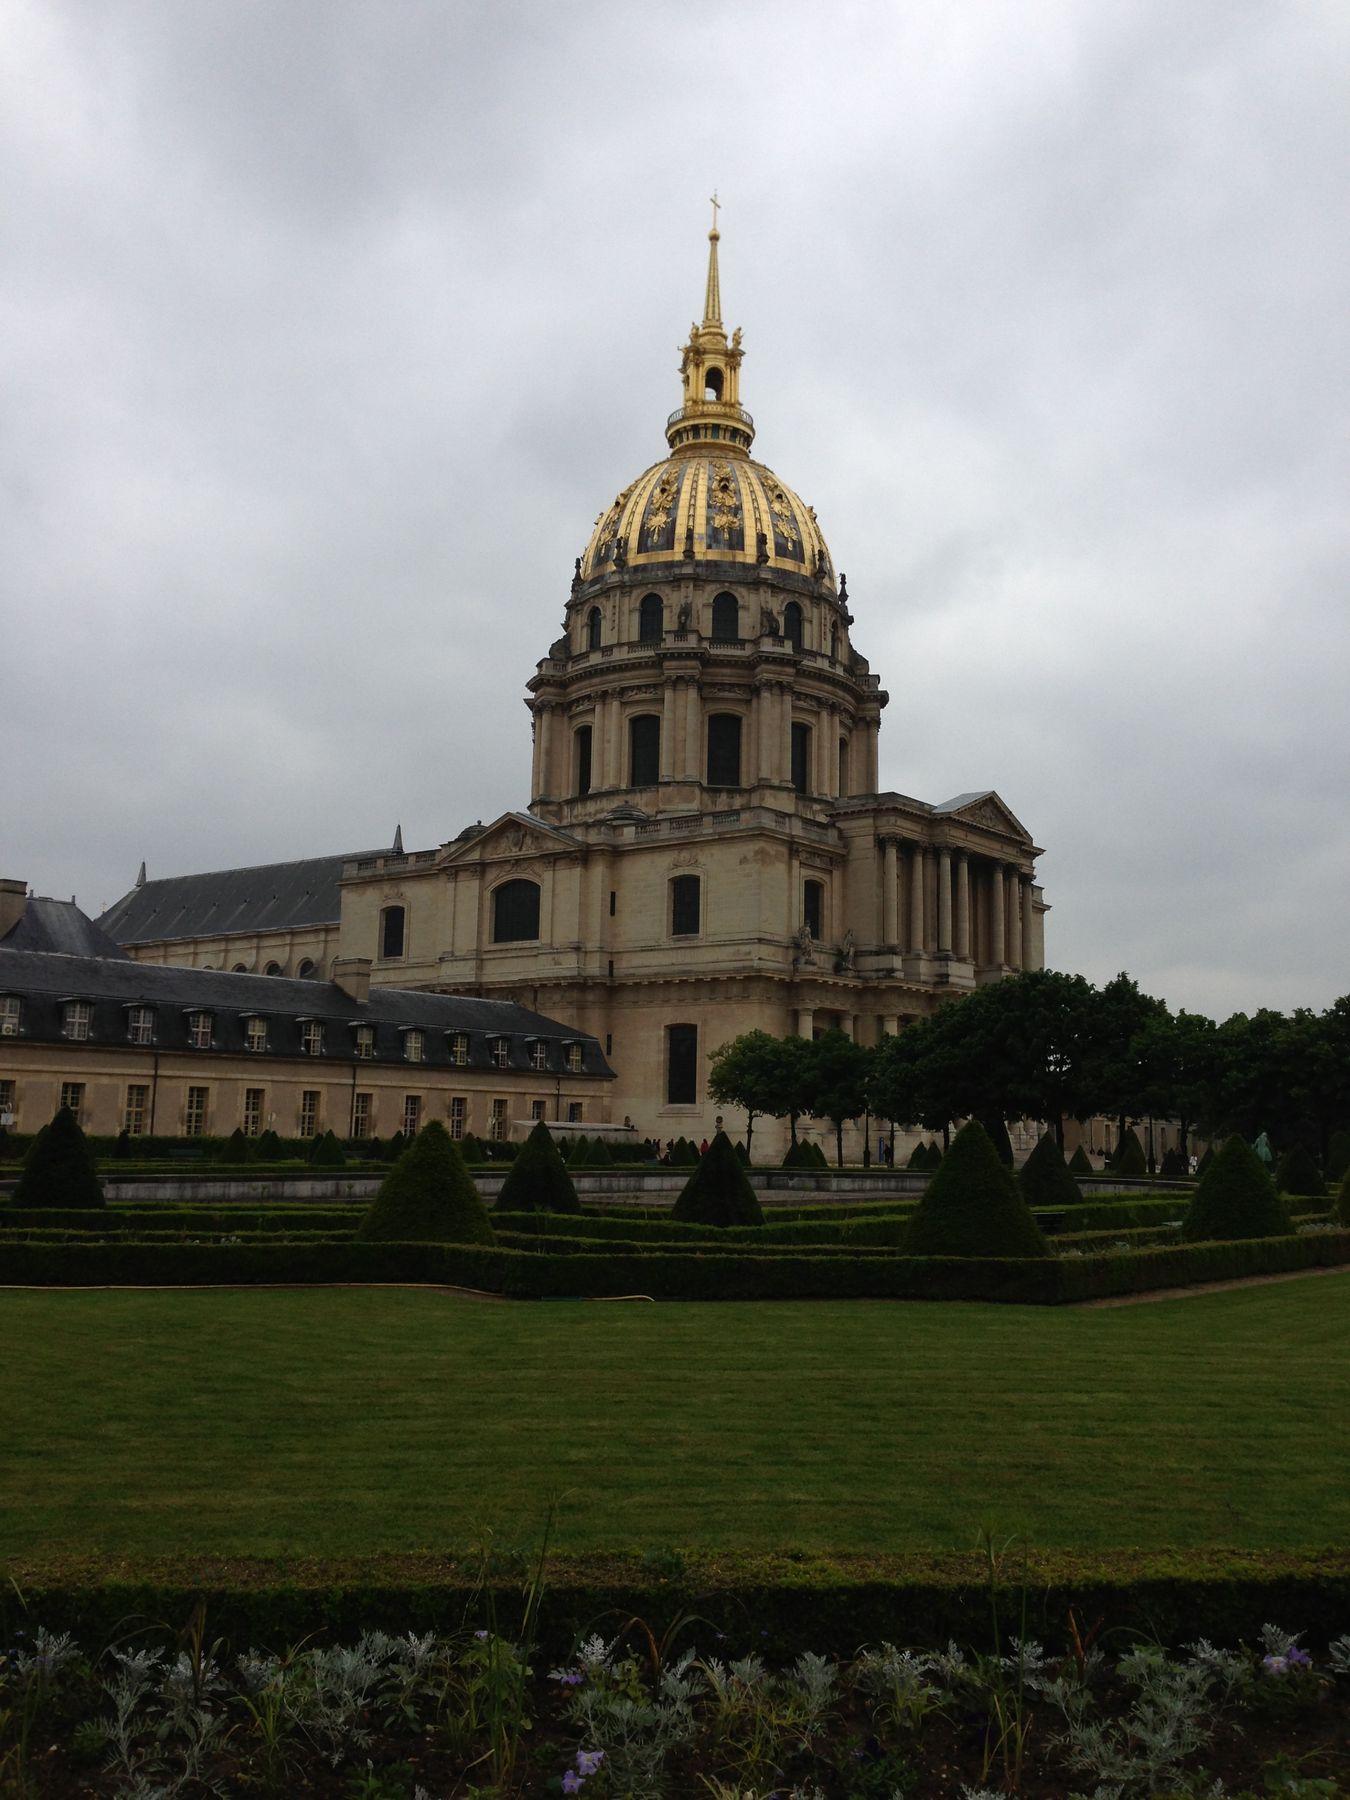 СОБОР ДОМА ИНВАЛИДОВ (ÉGLISE SAINT-LOUIS-DES-INVALIDES) Париж Собор дома инвалидов сад